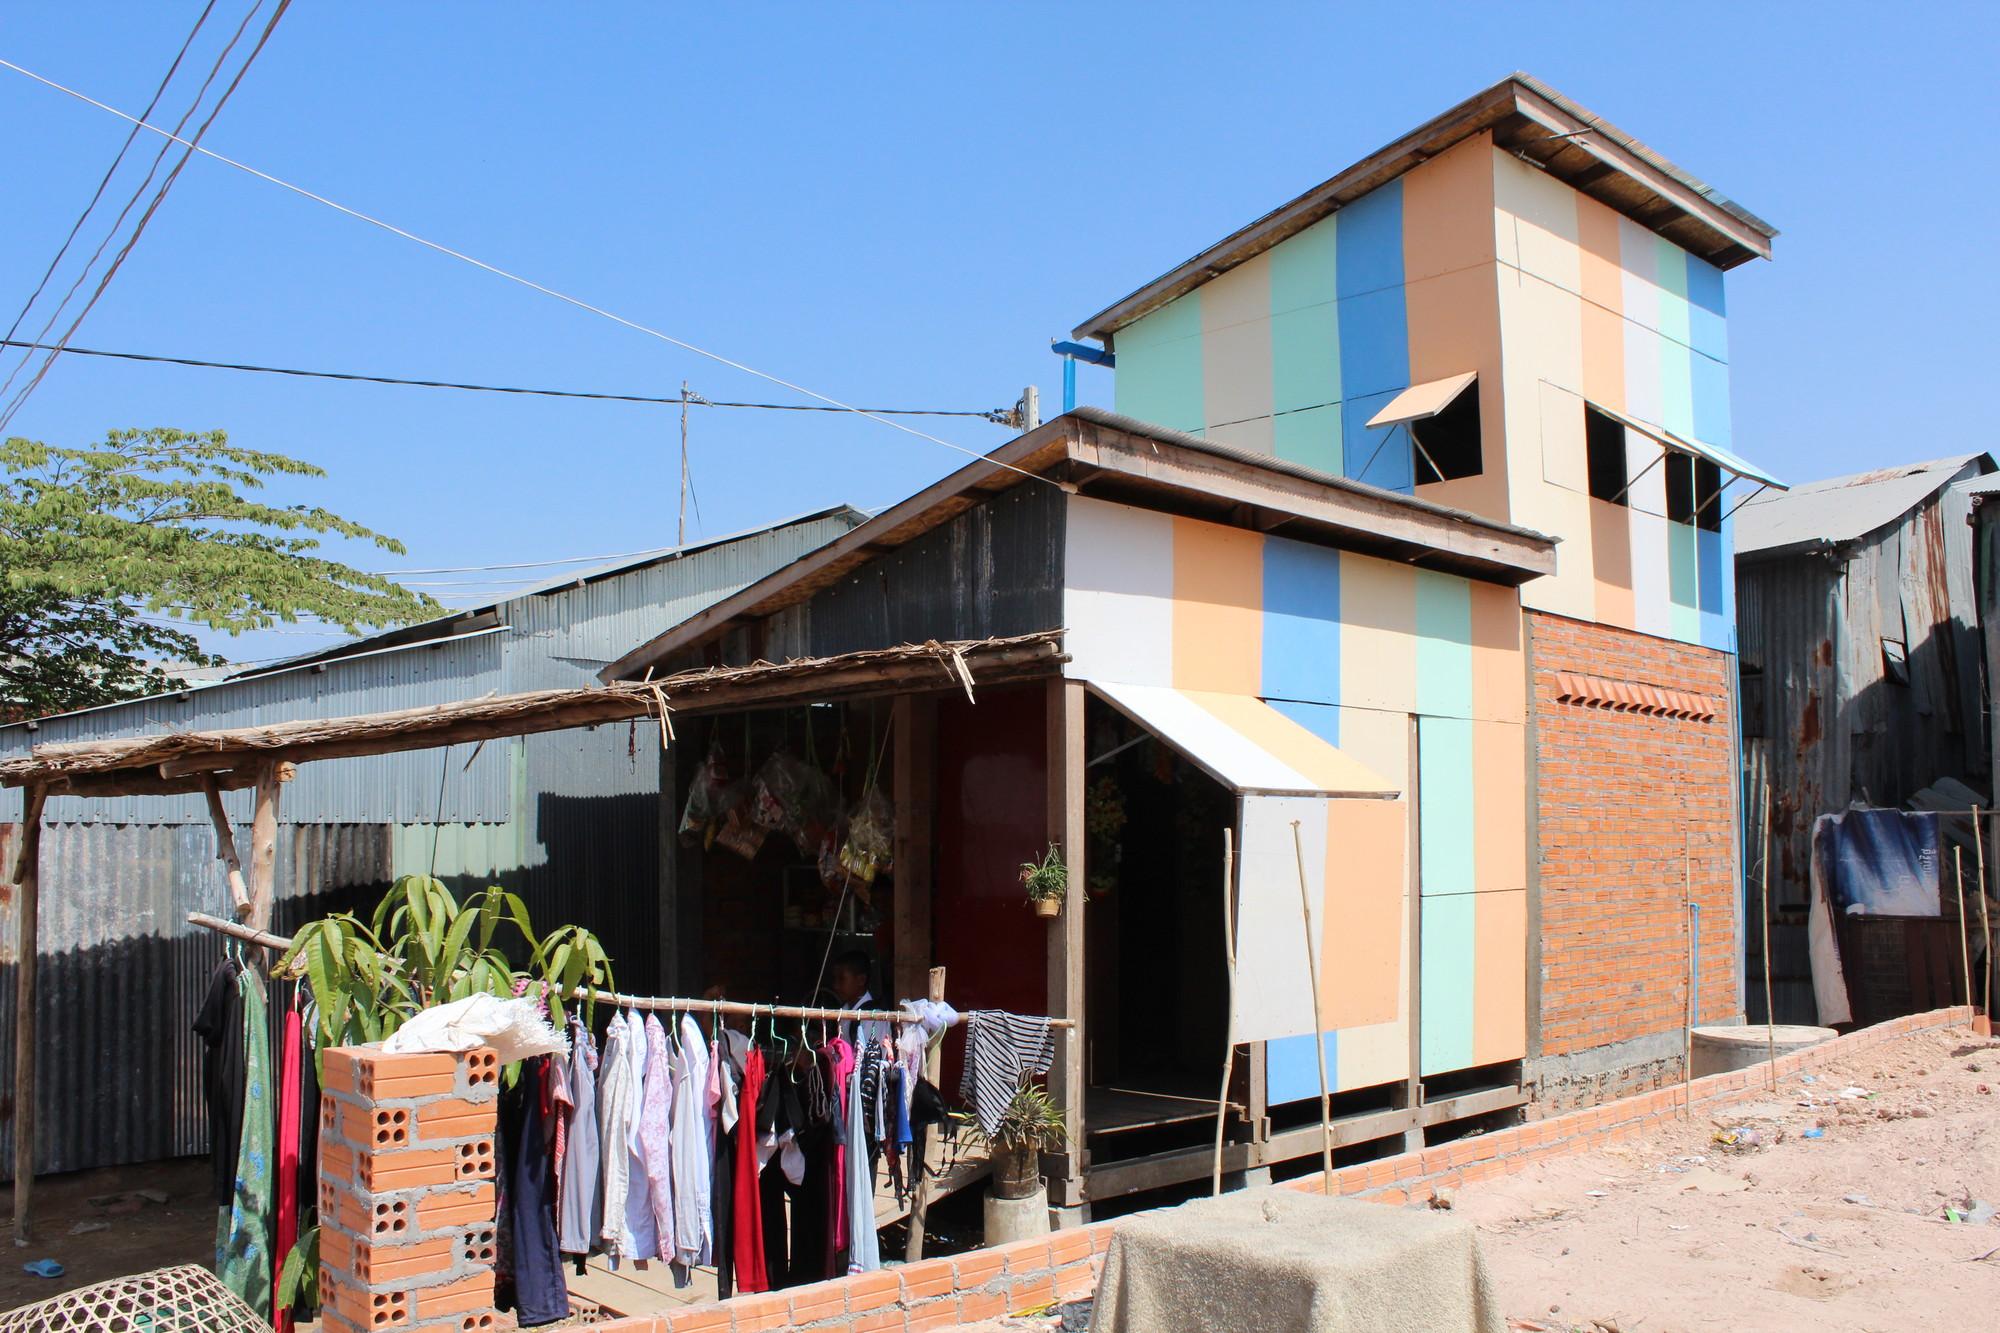 WET/DRY House . Imágen © Building Trust International